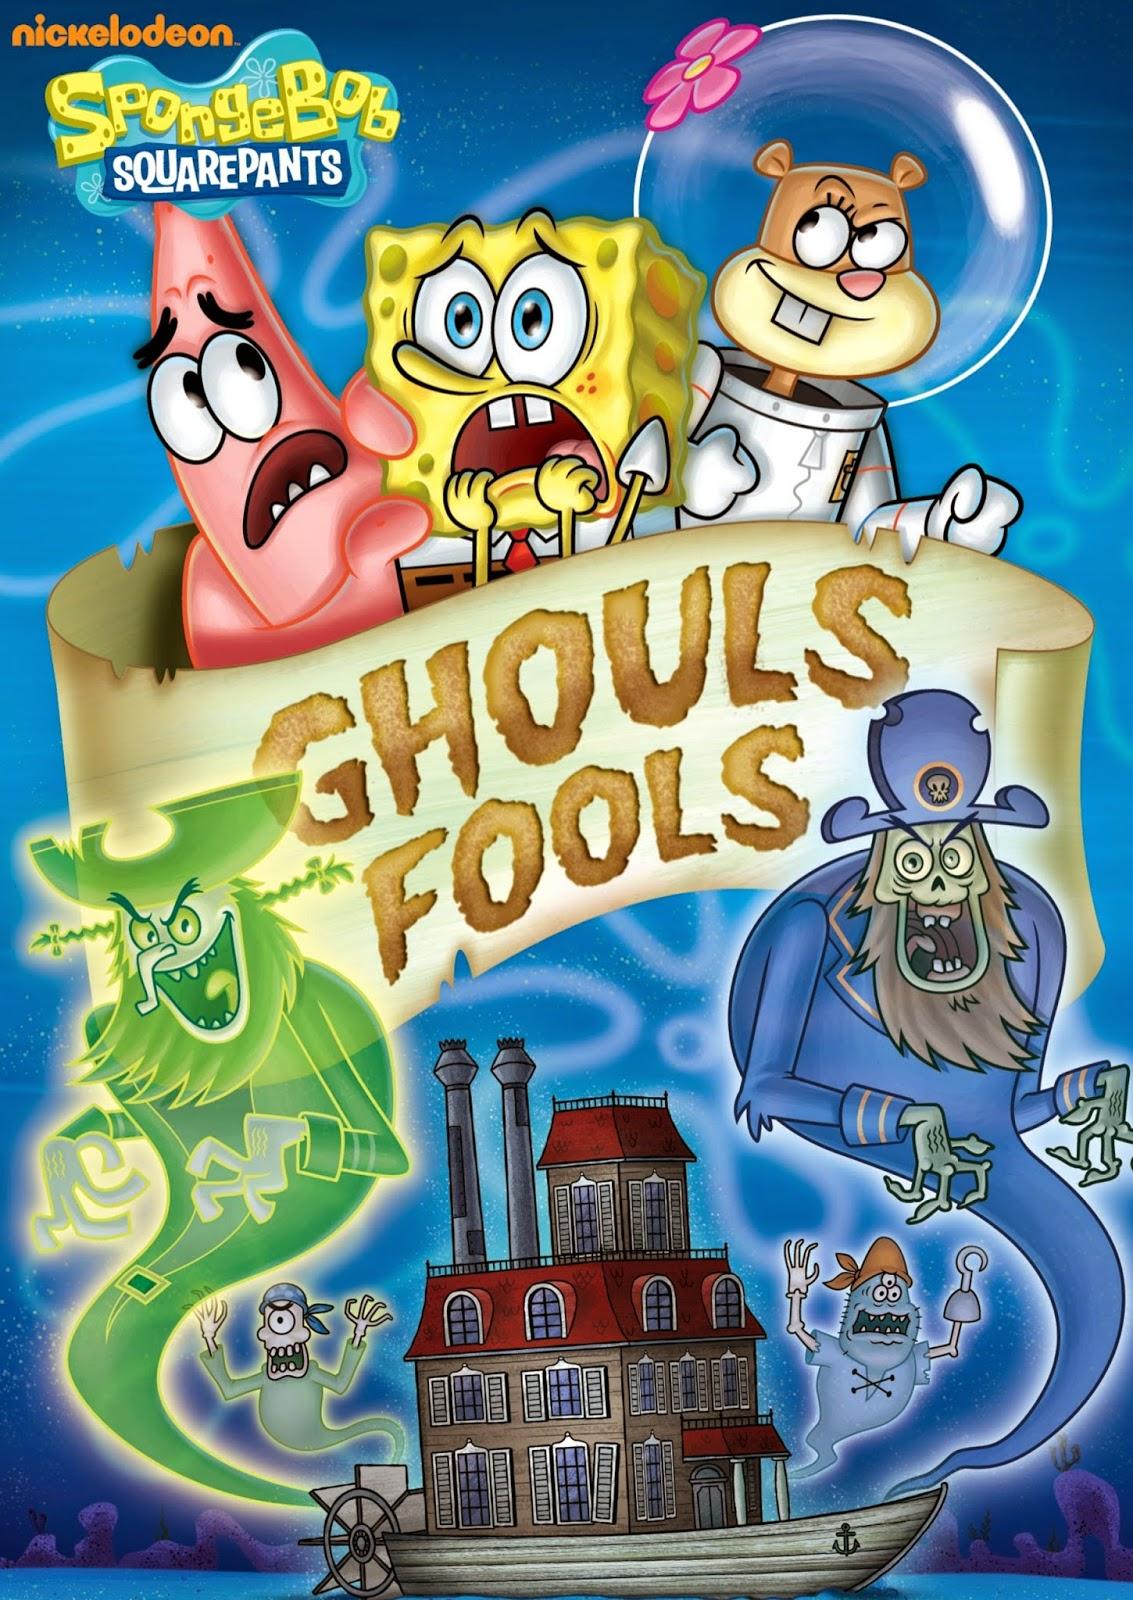 Nickelodeon Halloween Dvd Roundup Giveaway Mommy S